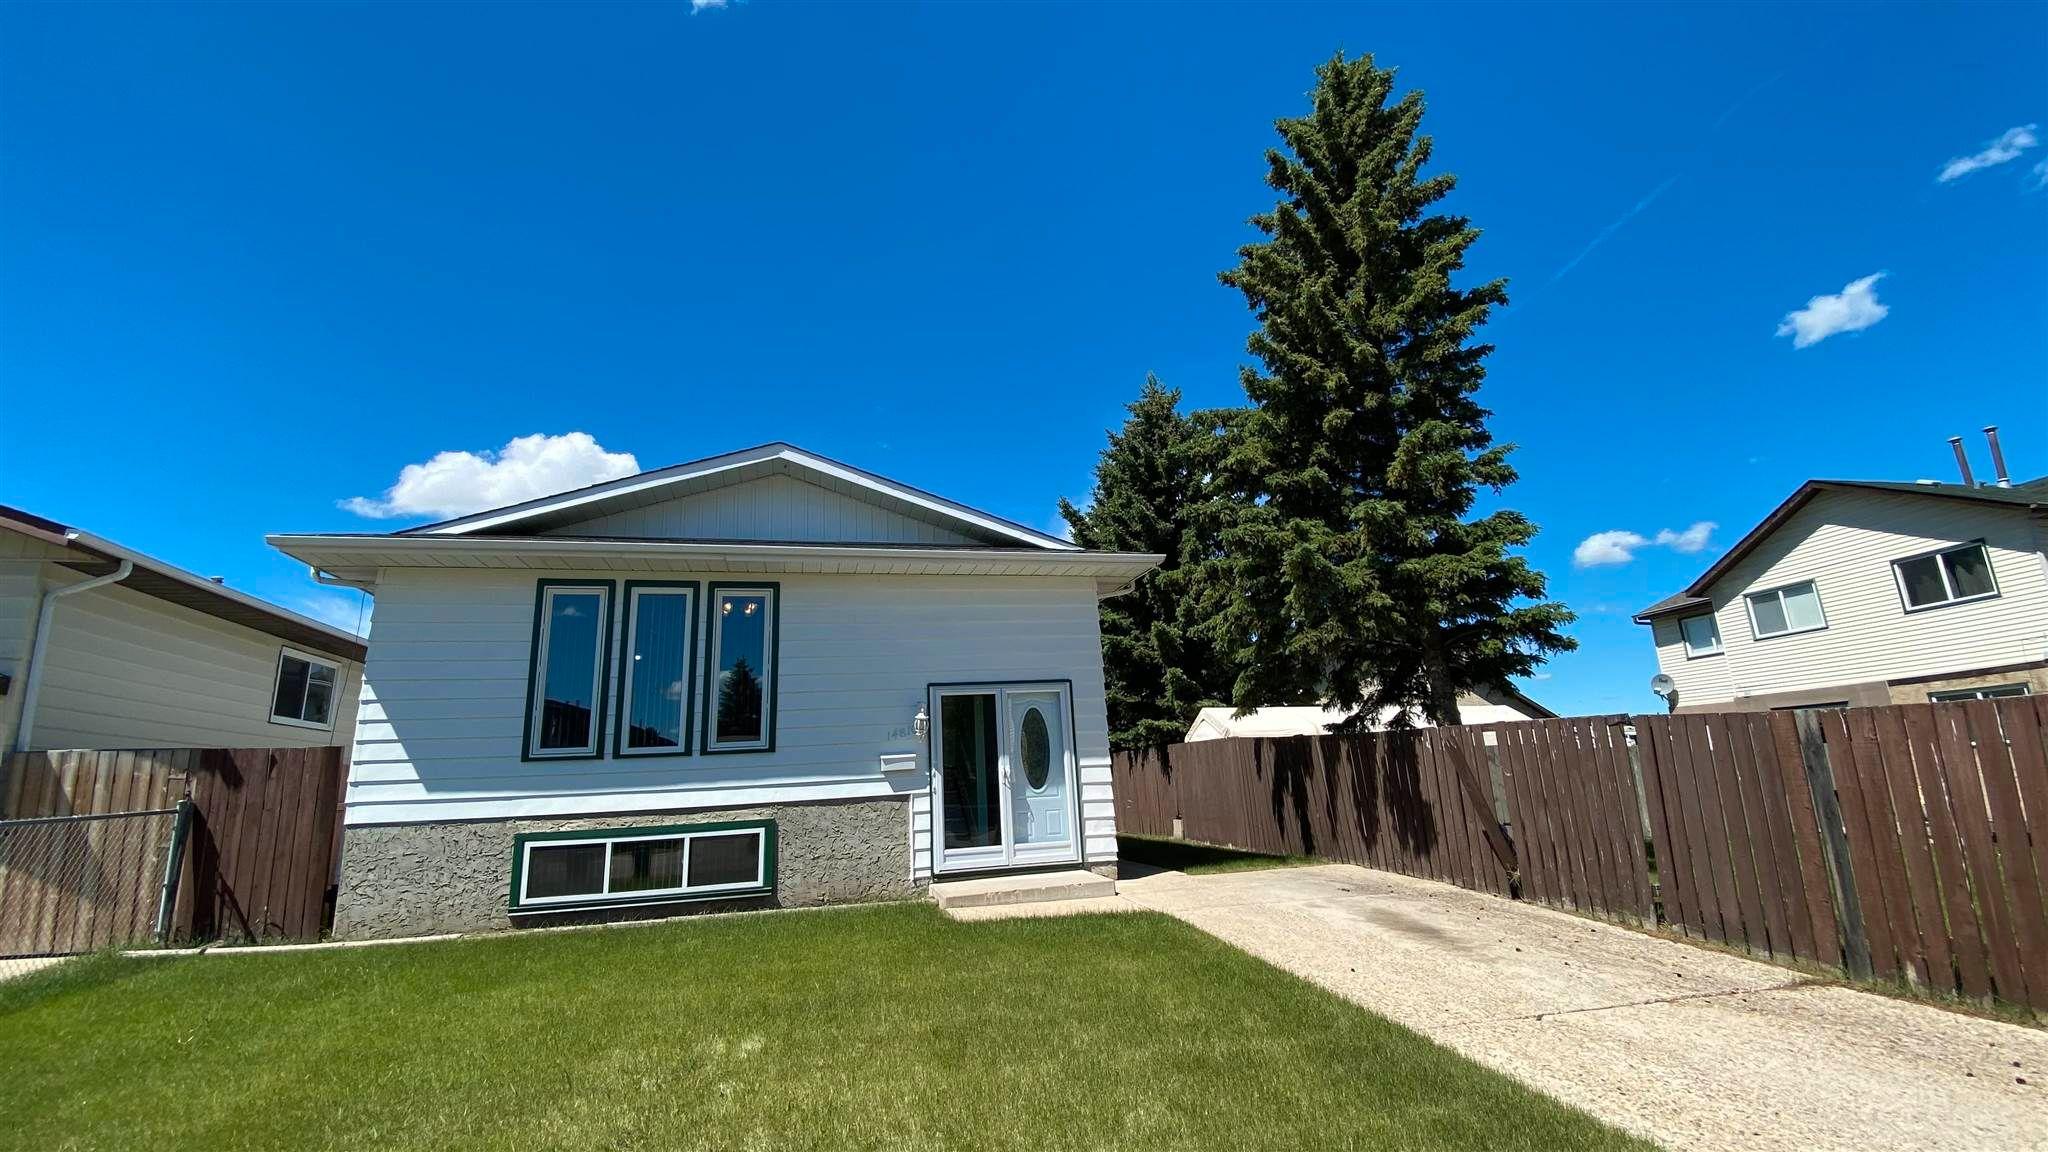 Main Photo: 14810 25 Street in Edmonton: Zone 35 House for sale : MLS®# E4250475